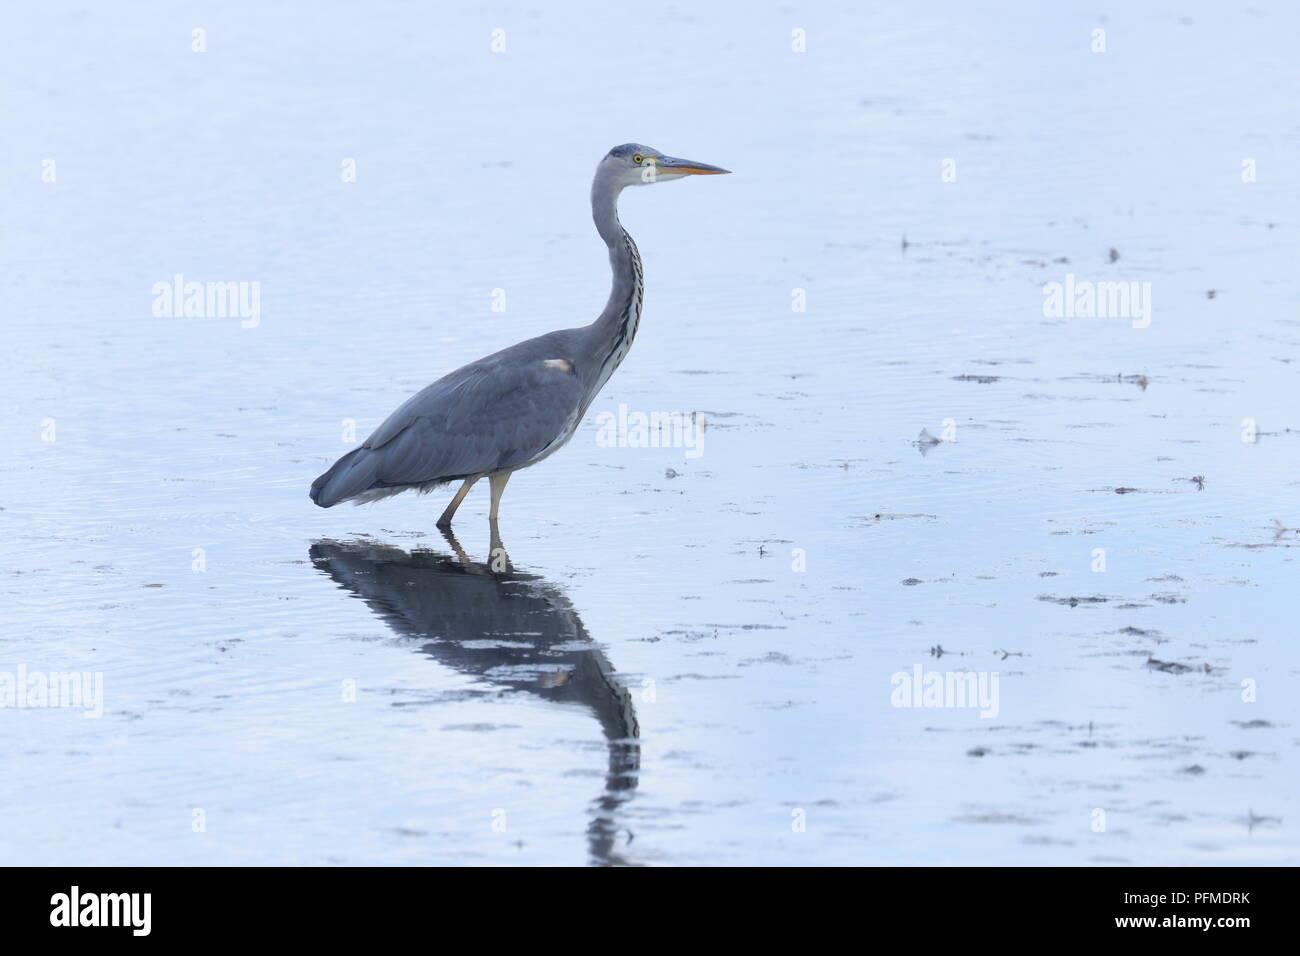 A Grey Heron fishing in a lake at RSPB St Aidan's Stock Photo